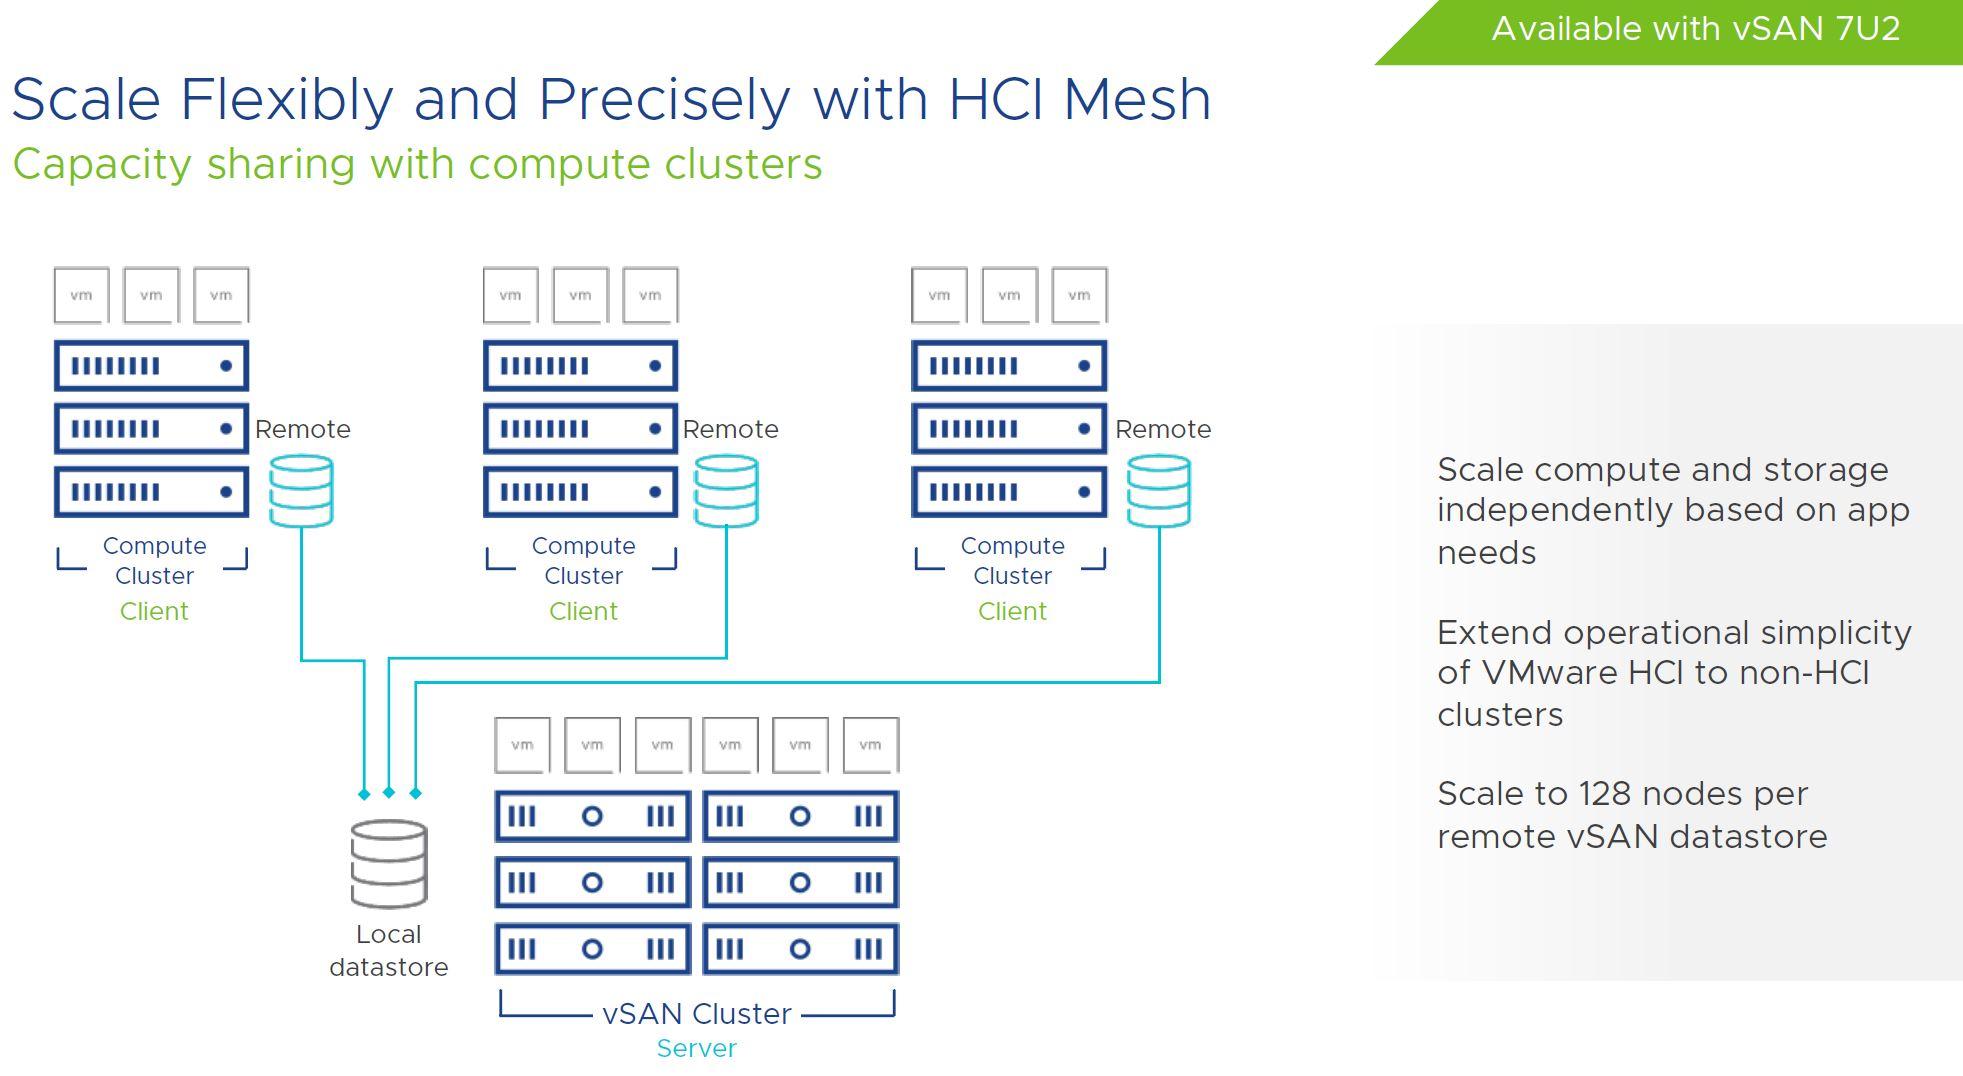 VMware VSAN 7U2 HCI Mesh